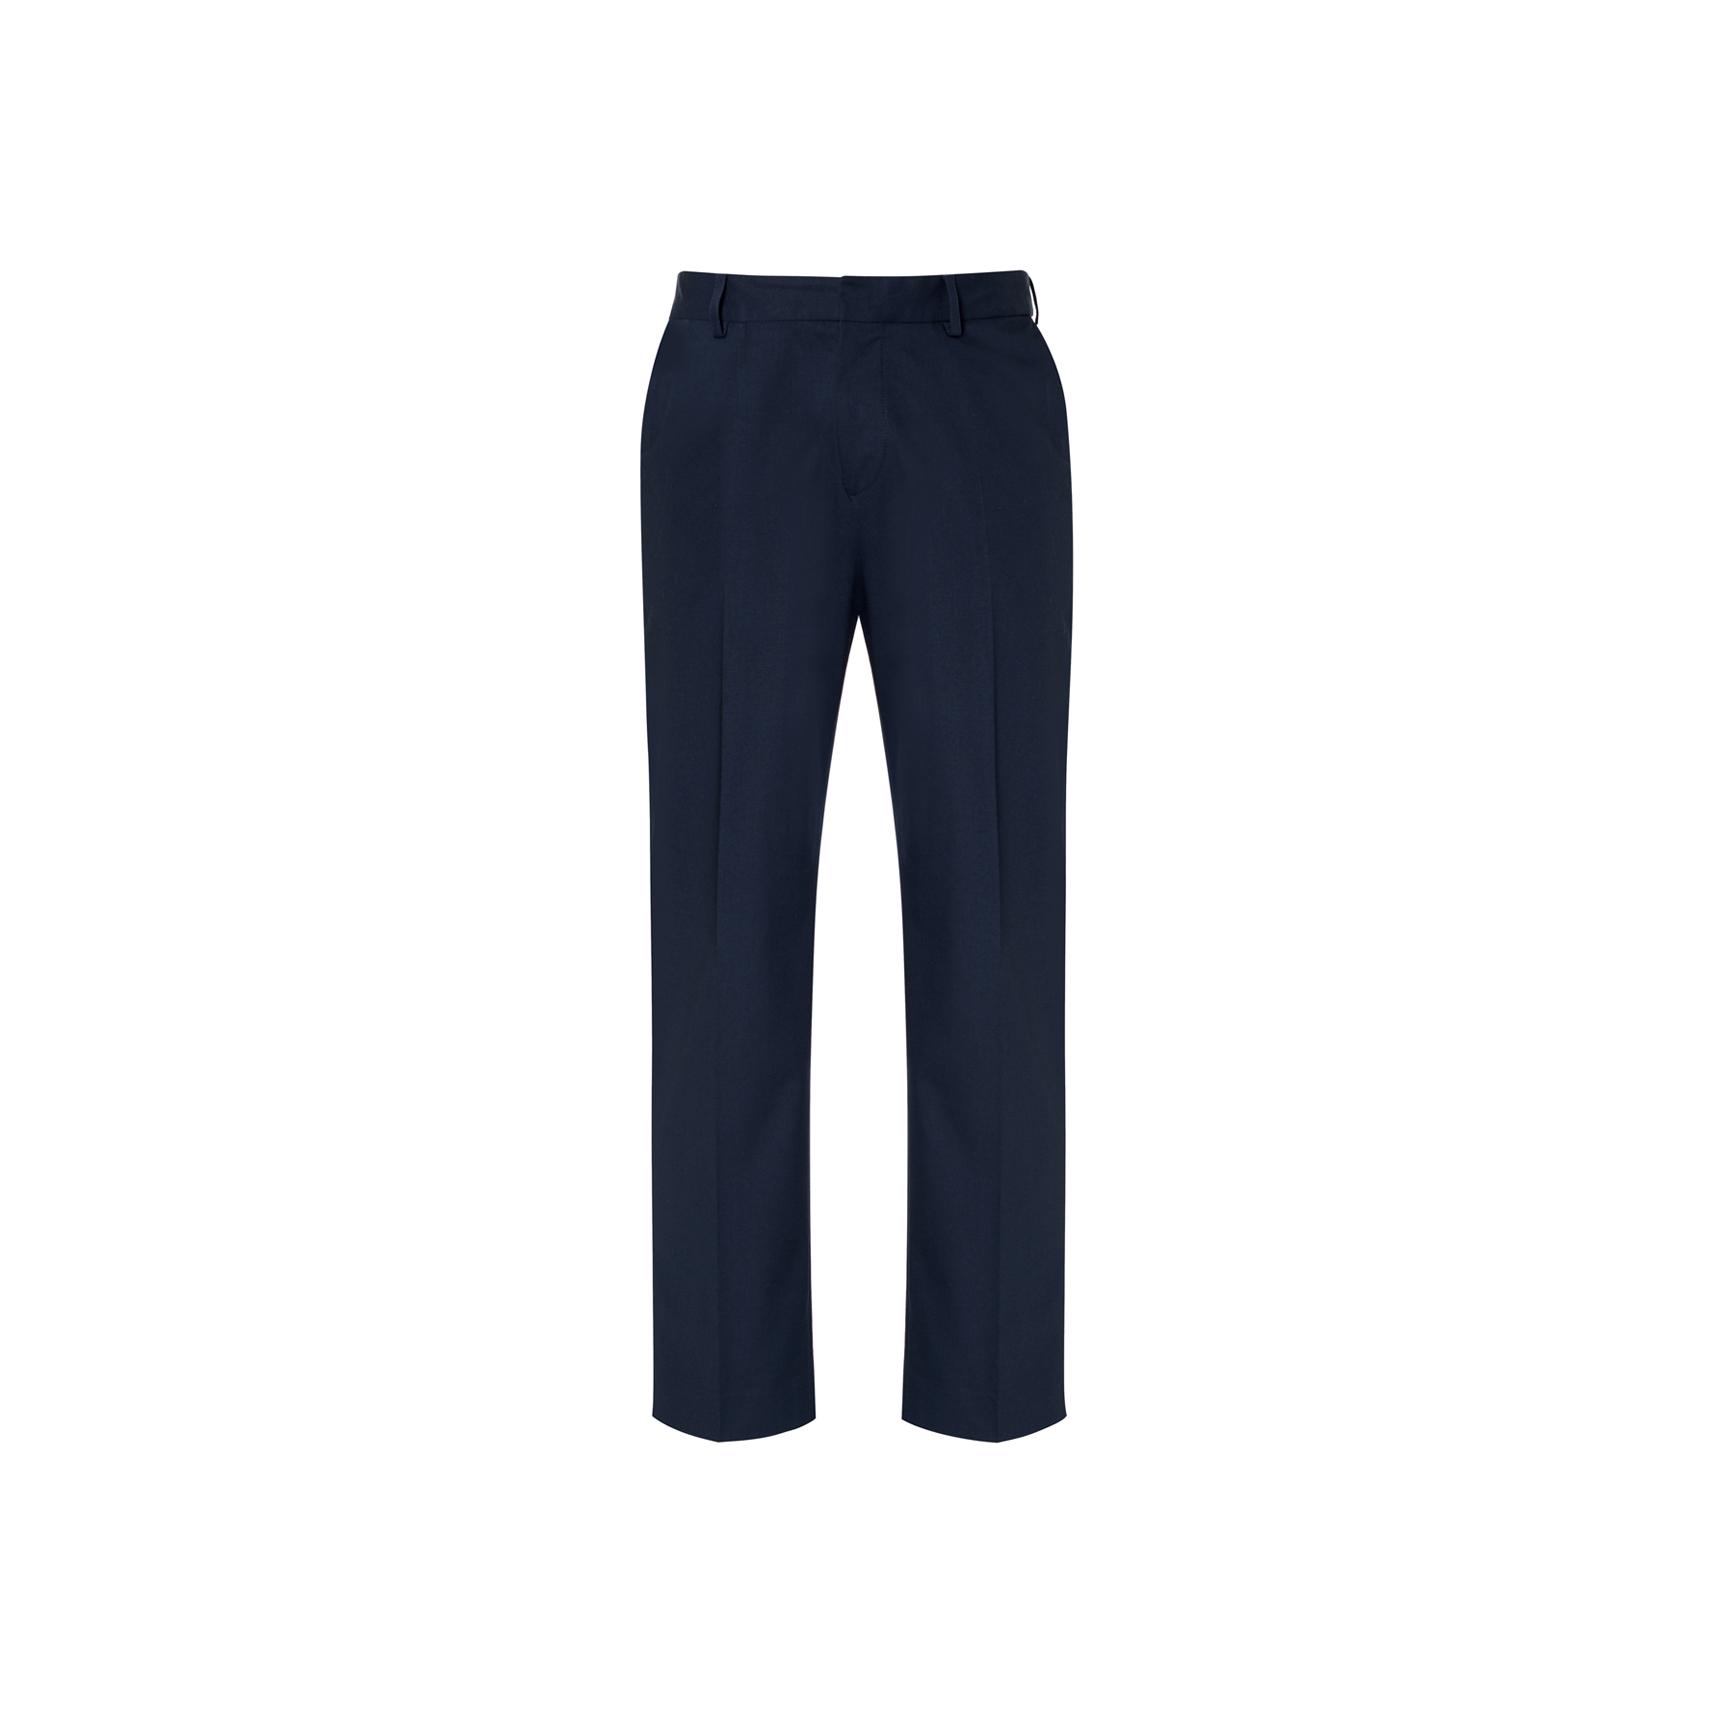 dark-navy-boys-suit-trousers_fr